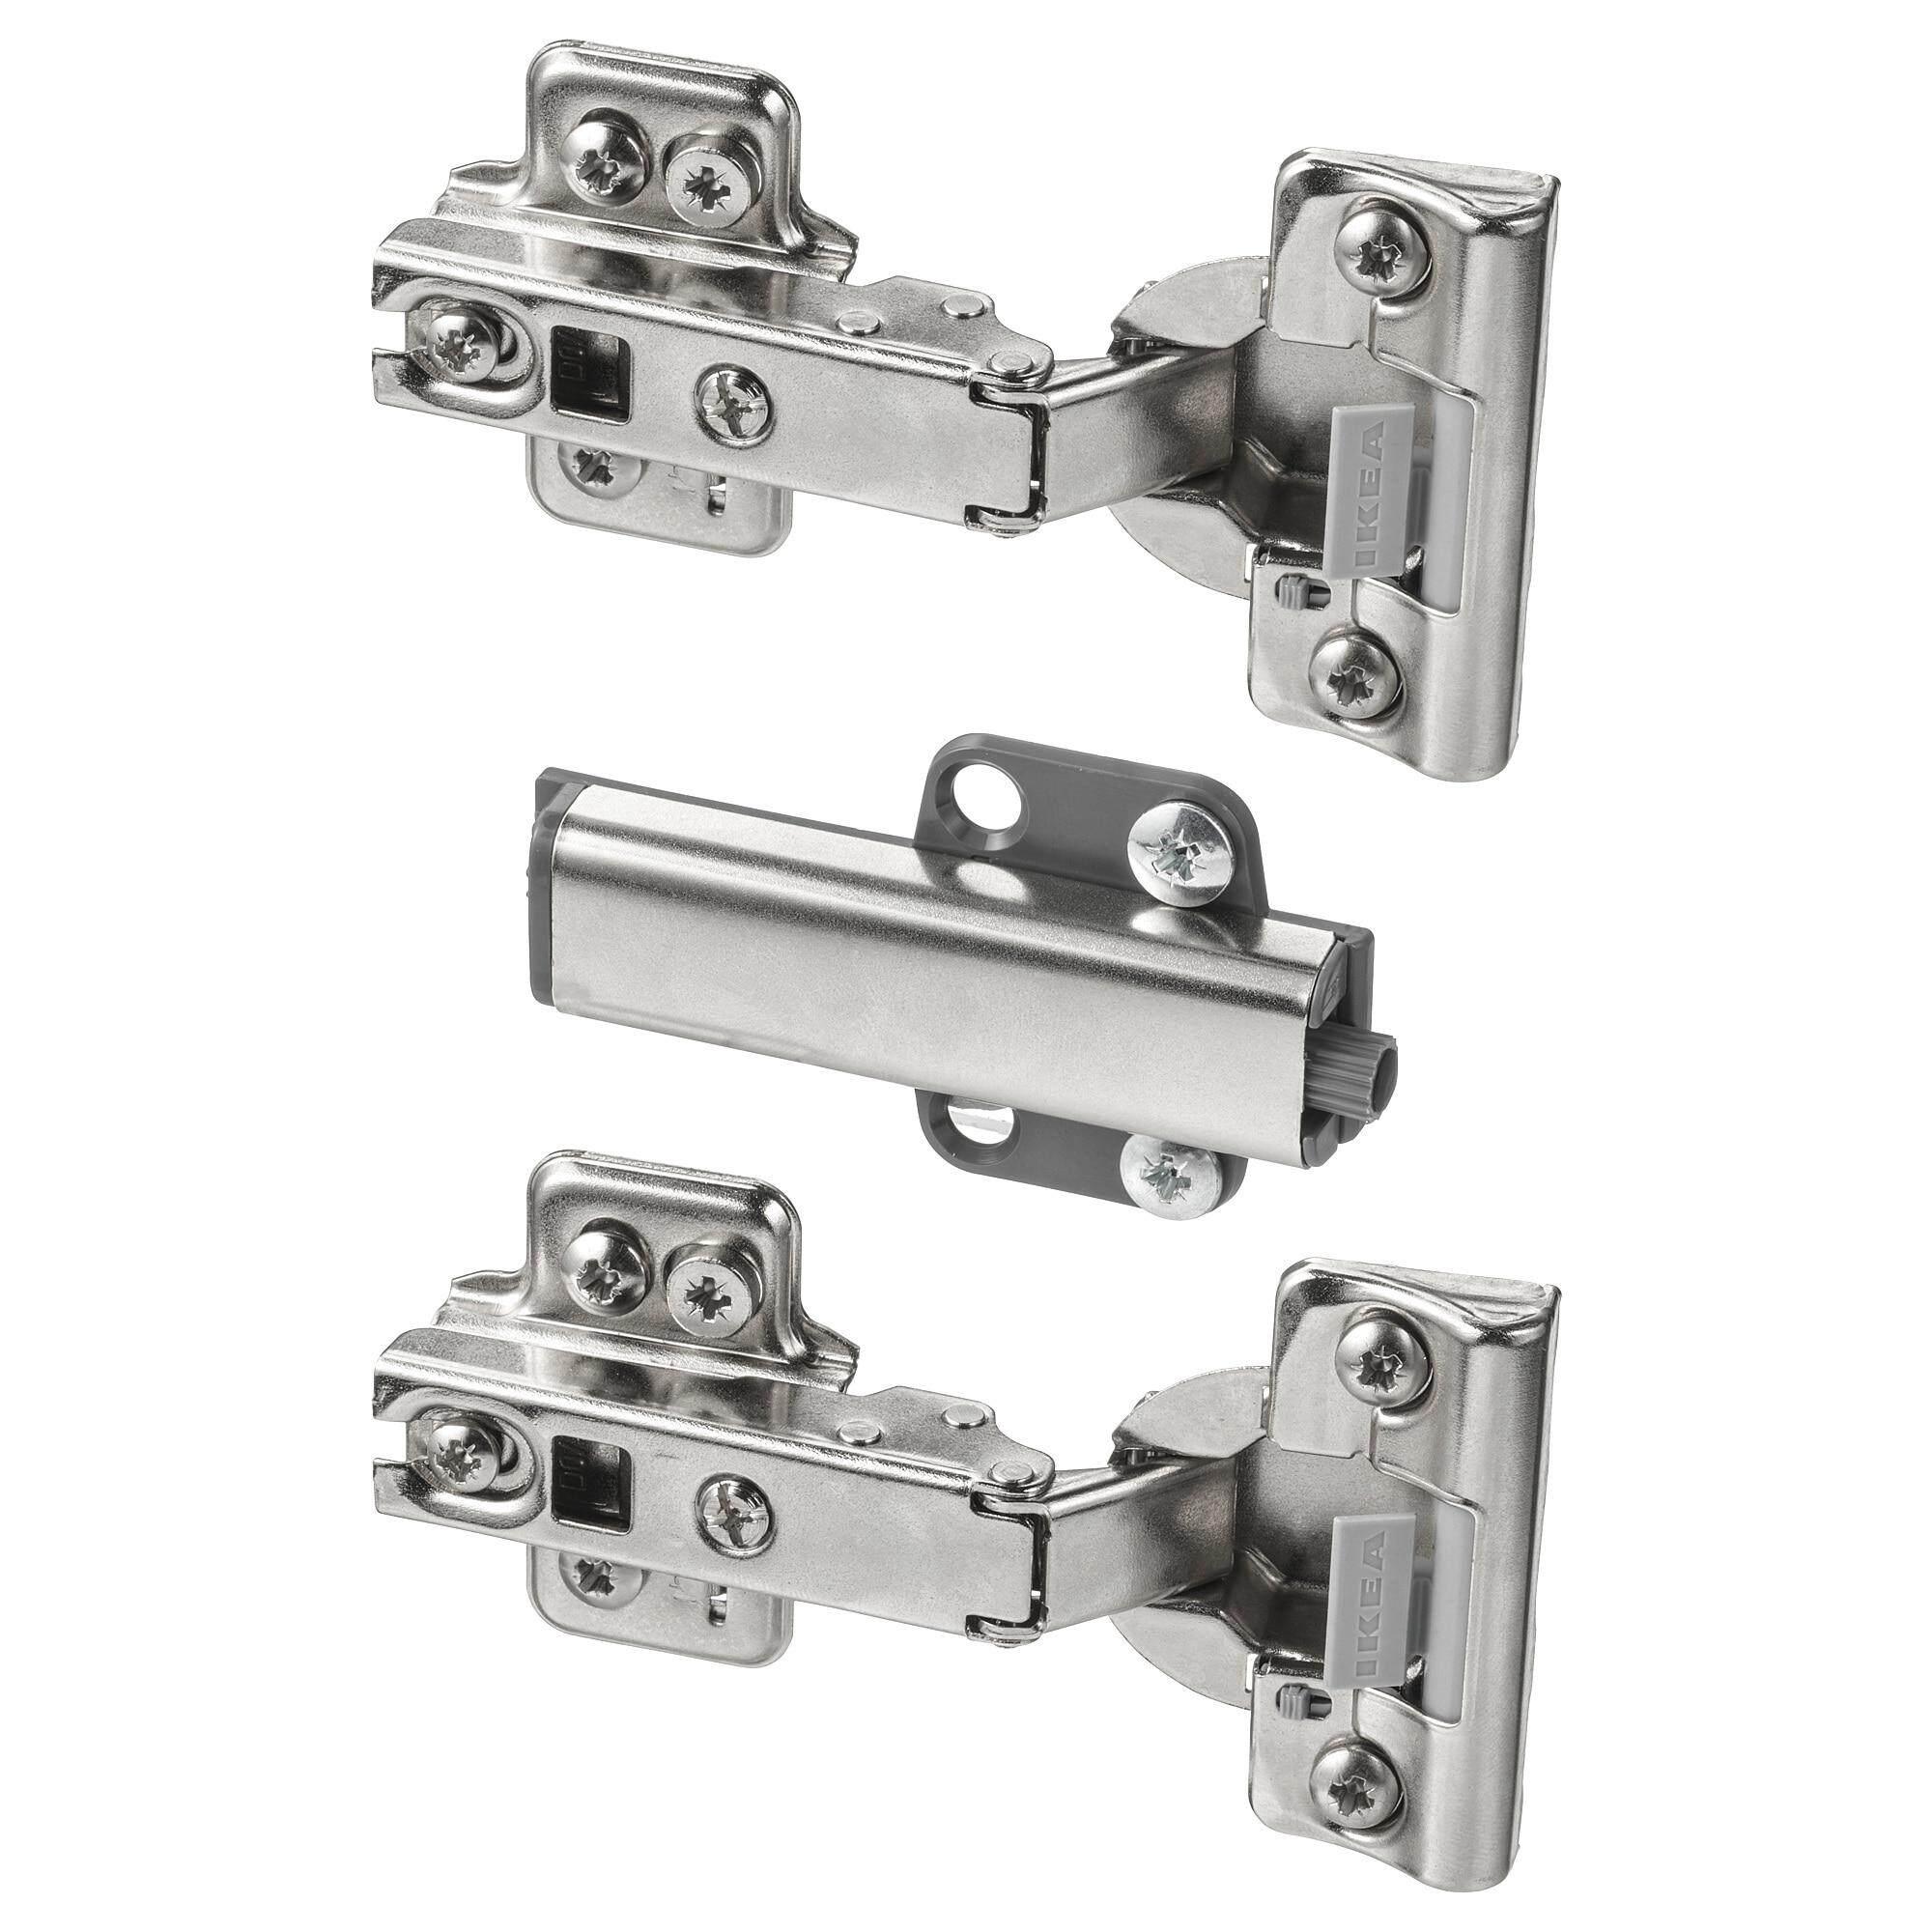 IKEA BESTÅ Soft closing/push-open hinge - 2 pieces